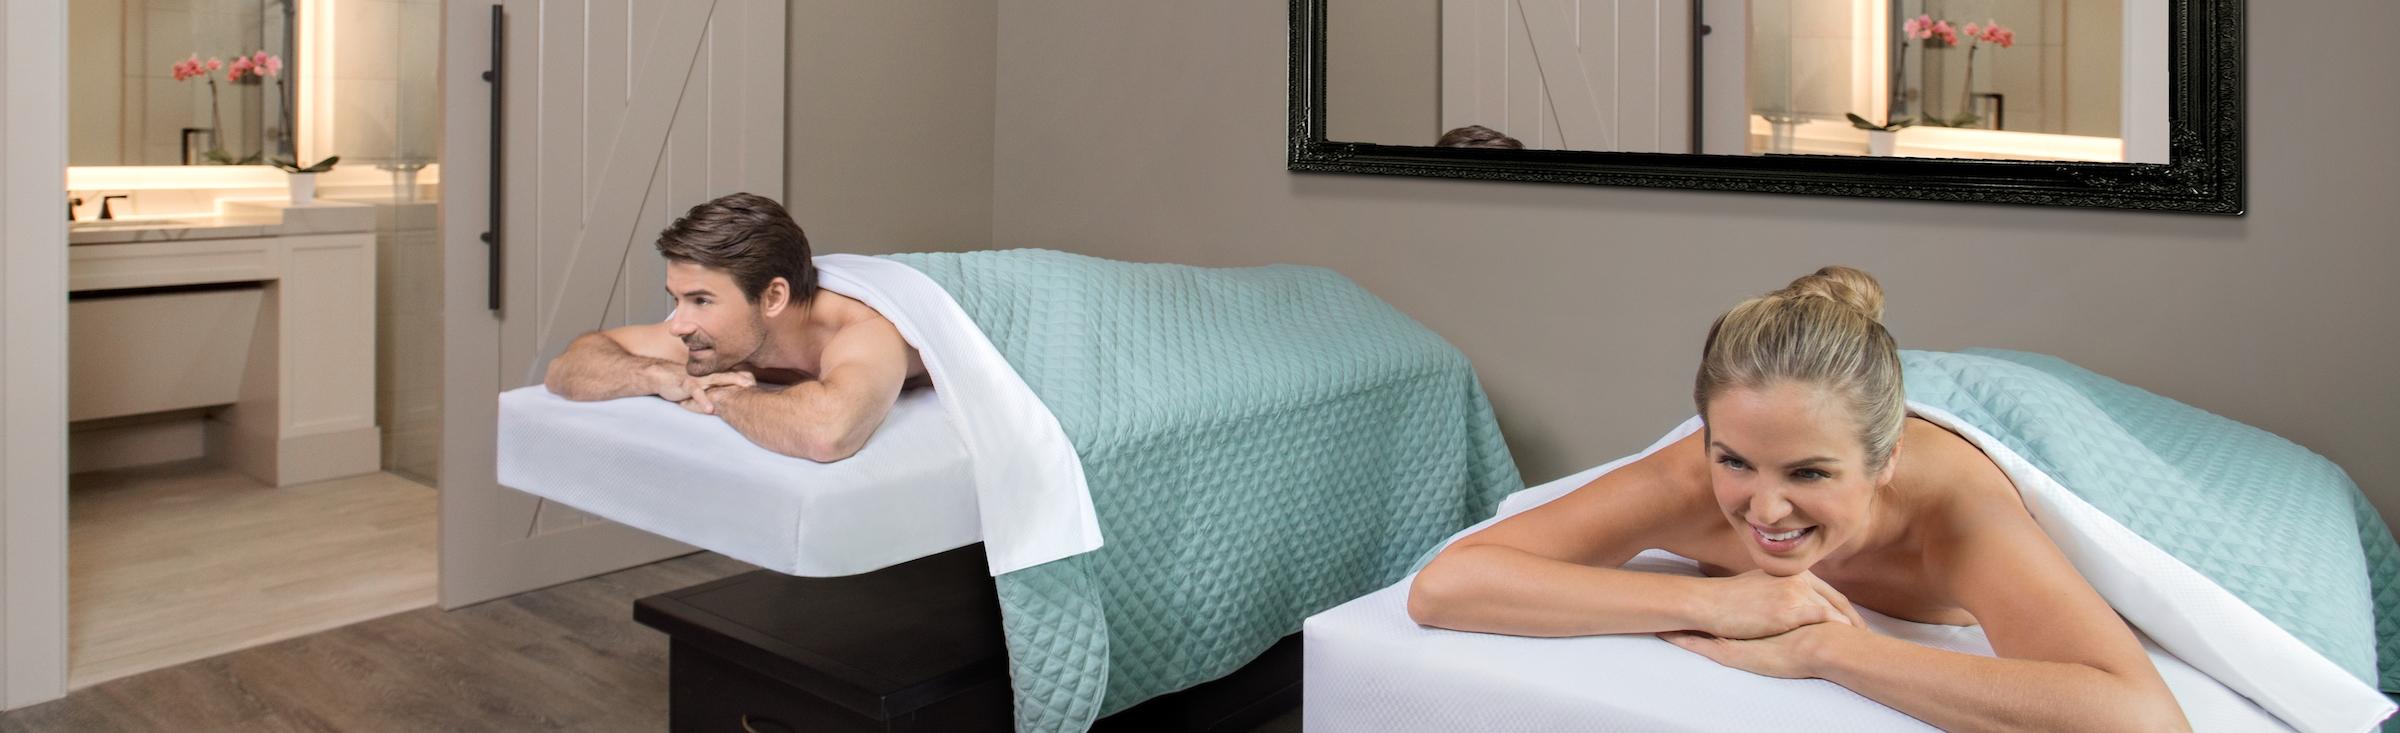 Spa 33 Couples Massage.jpg